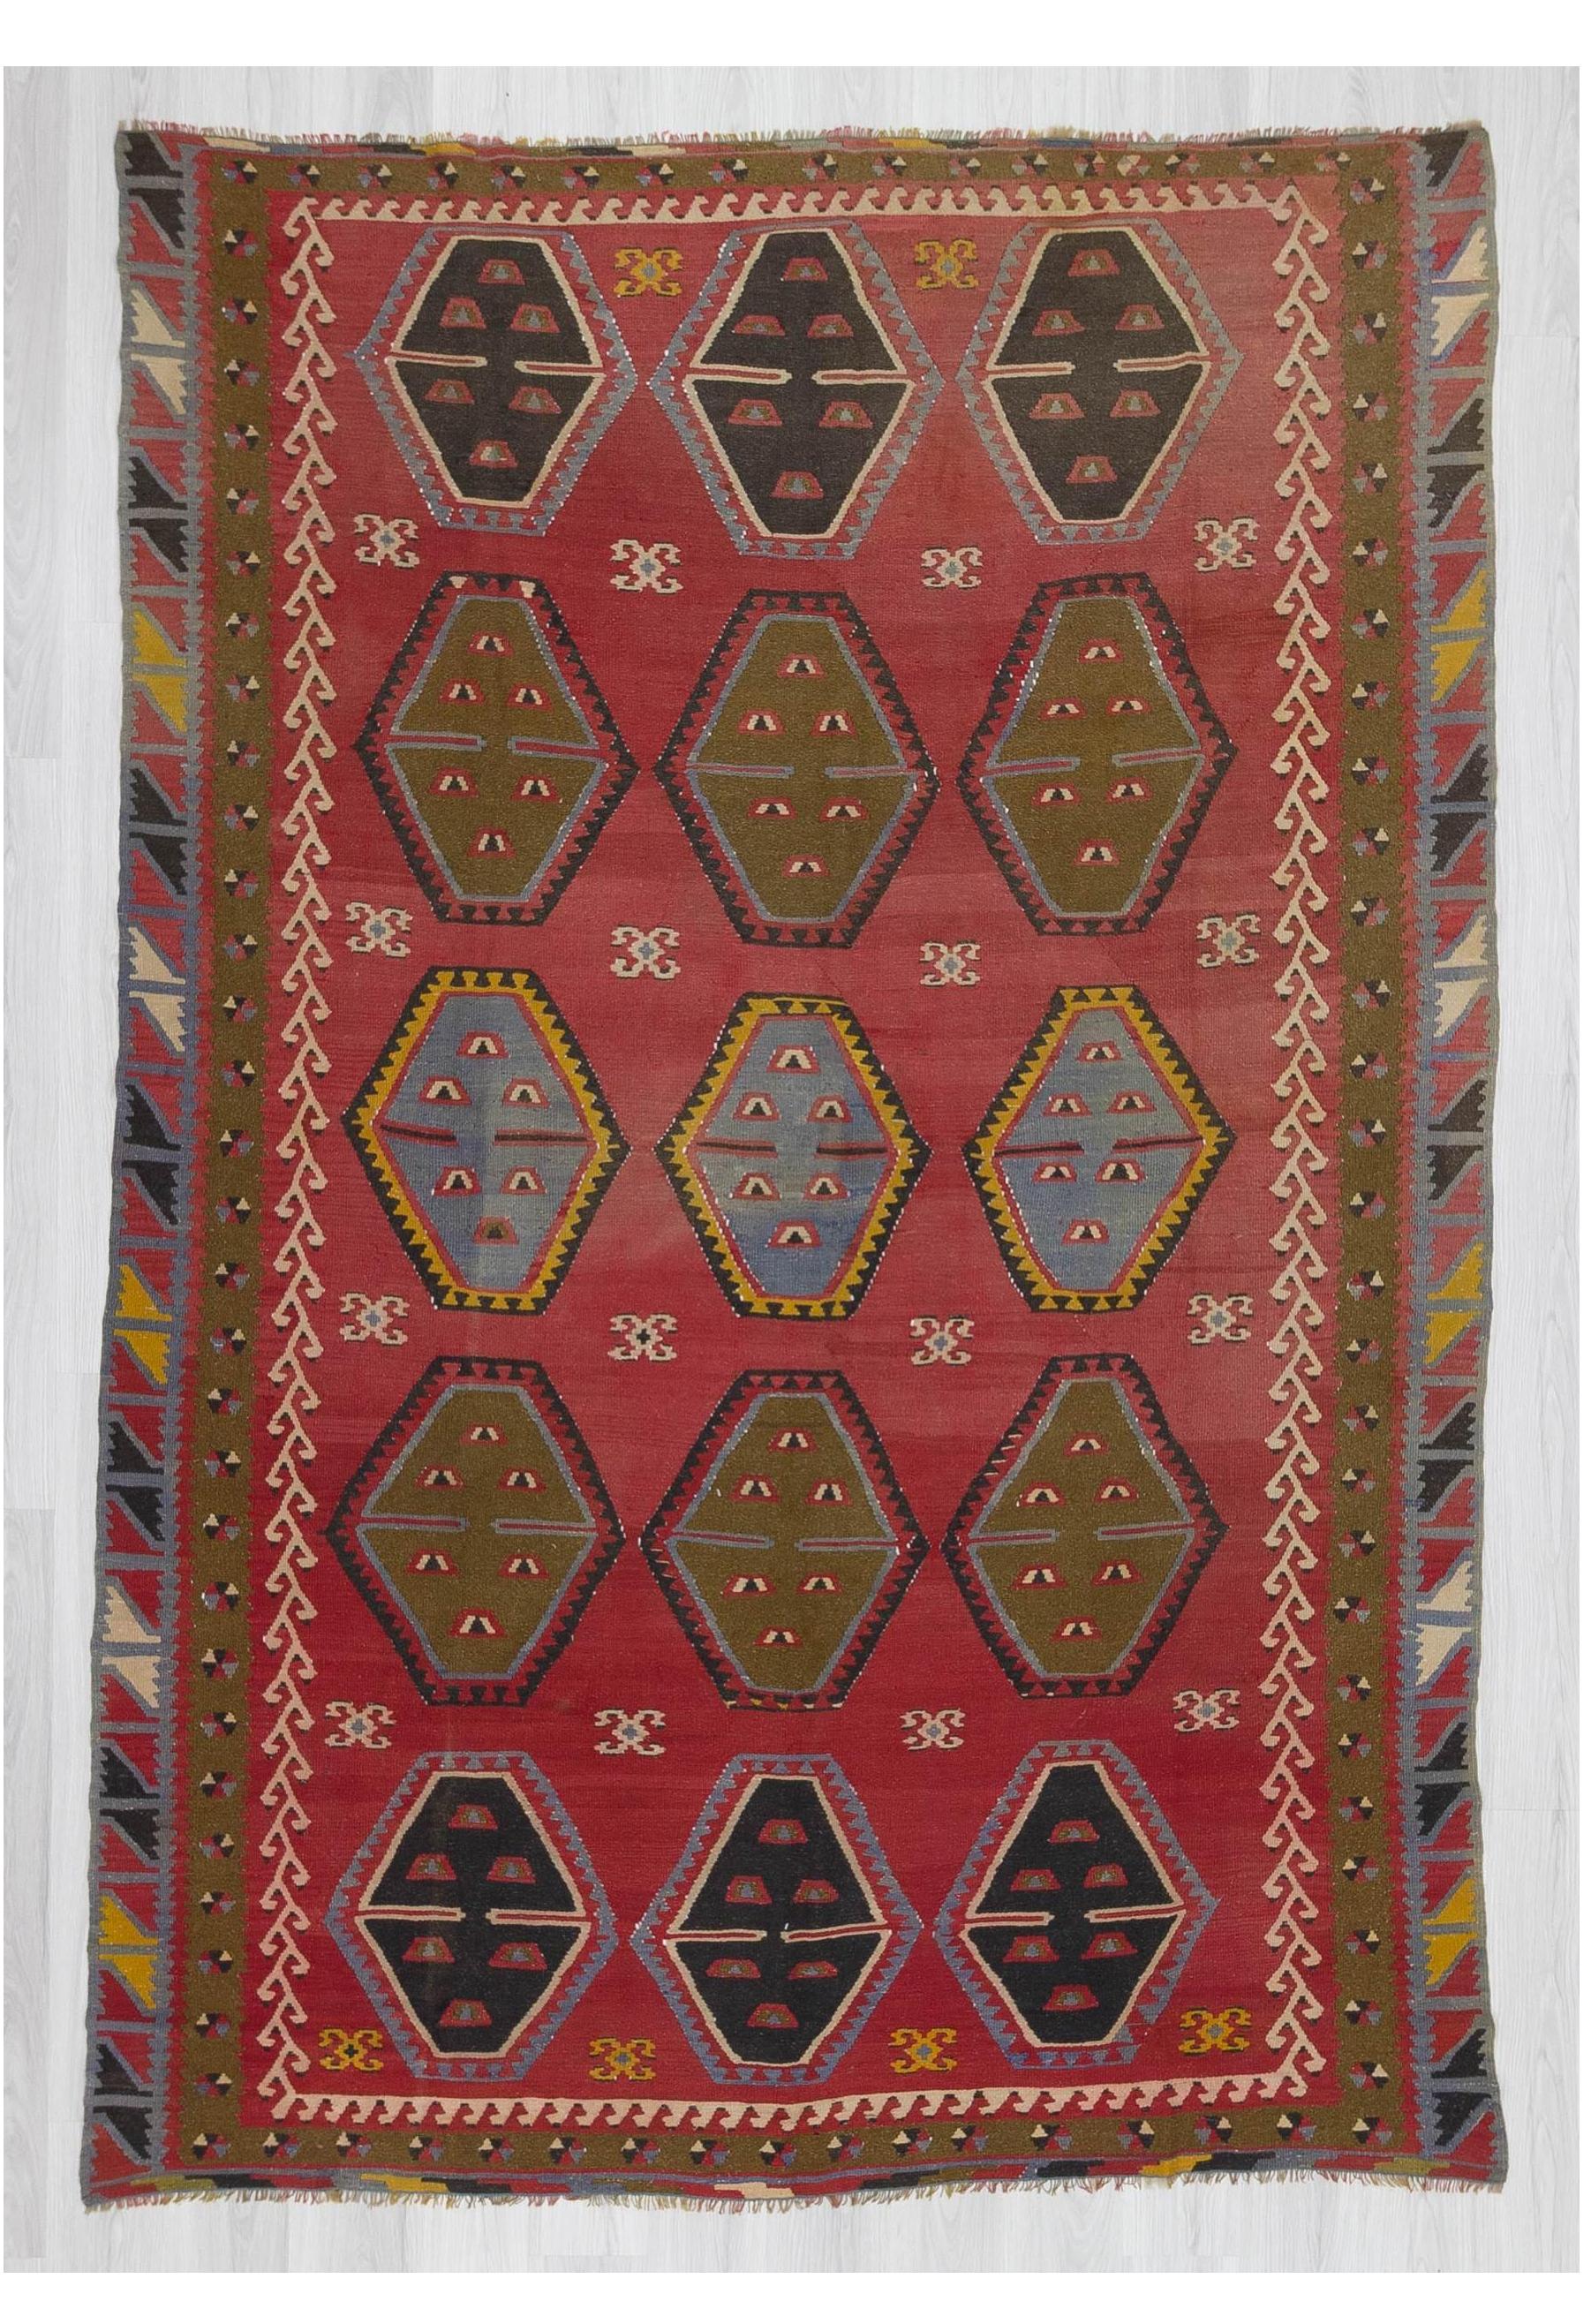 Vintage Oversized Decorative Turkish Kilim Rug 7 4 215 10